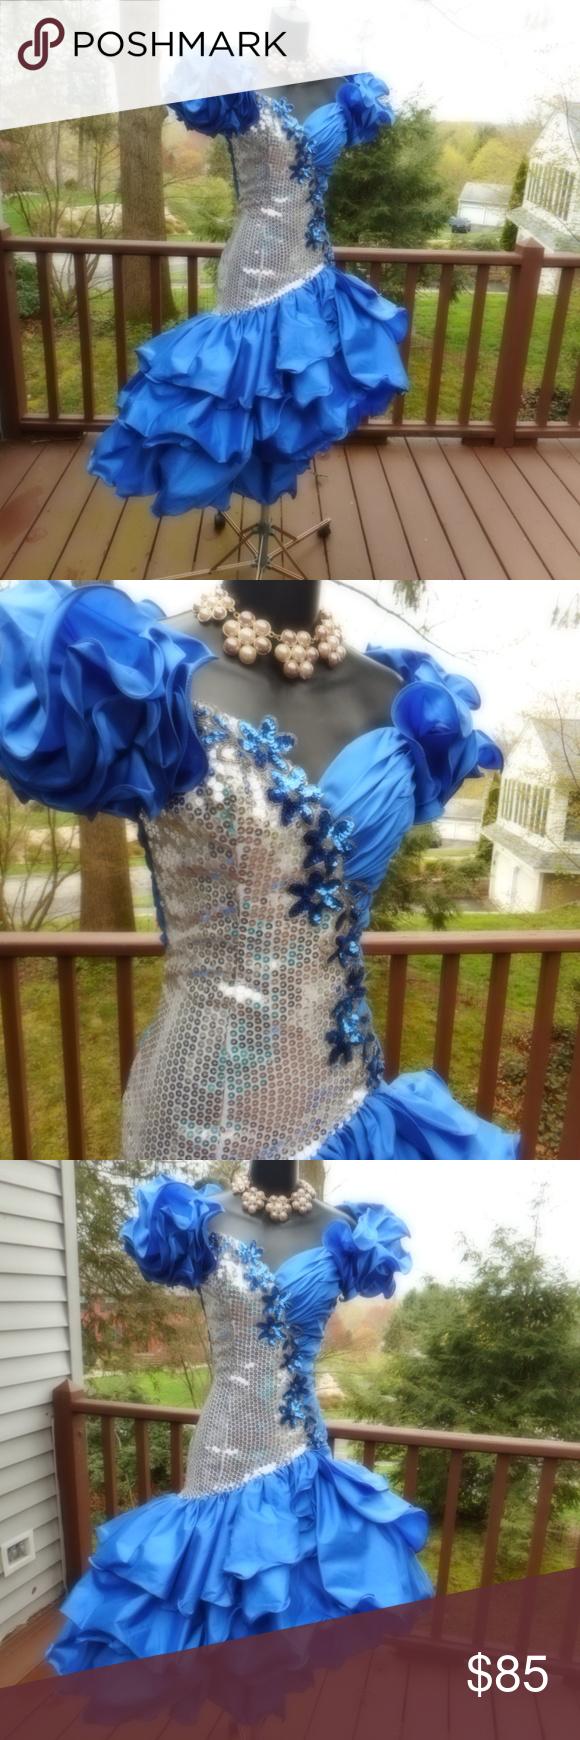 Vintage 80s Total Wild Child Prom Party Dress Xs S Prom Party Dresses 80s Prom Dress Costume Alyce Prom Dress [ 1740 x 580 Pixel ]